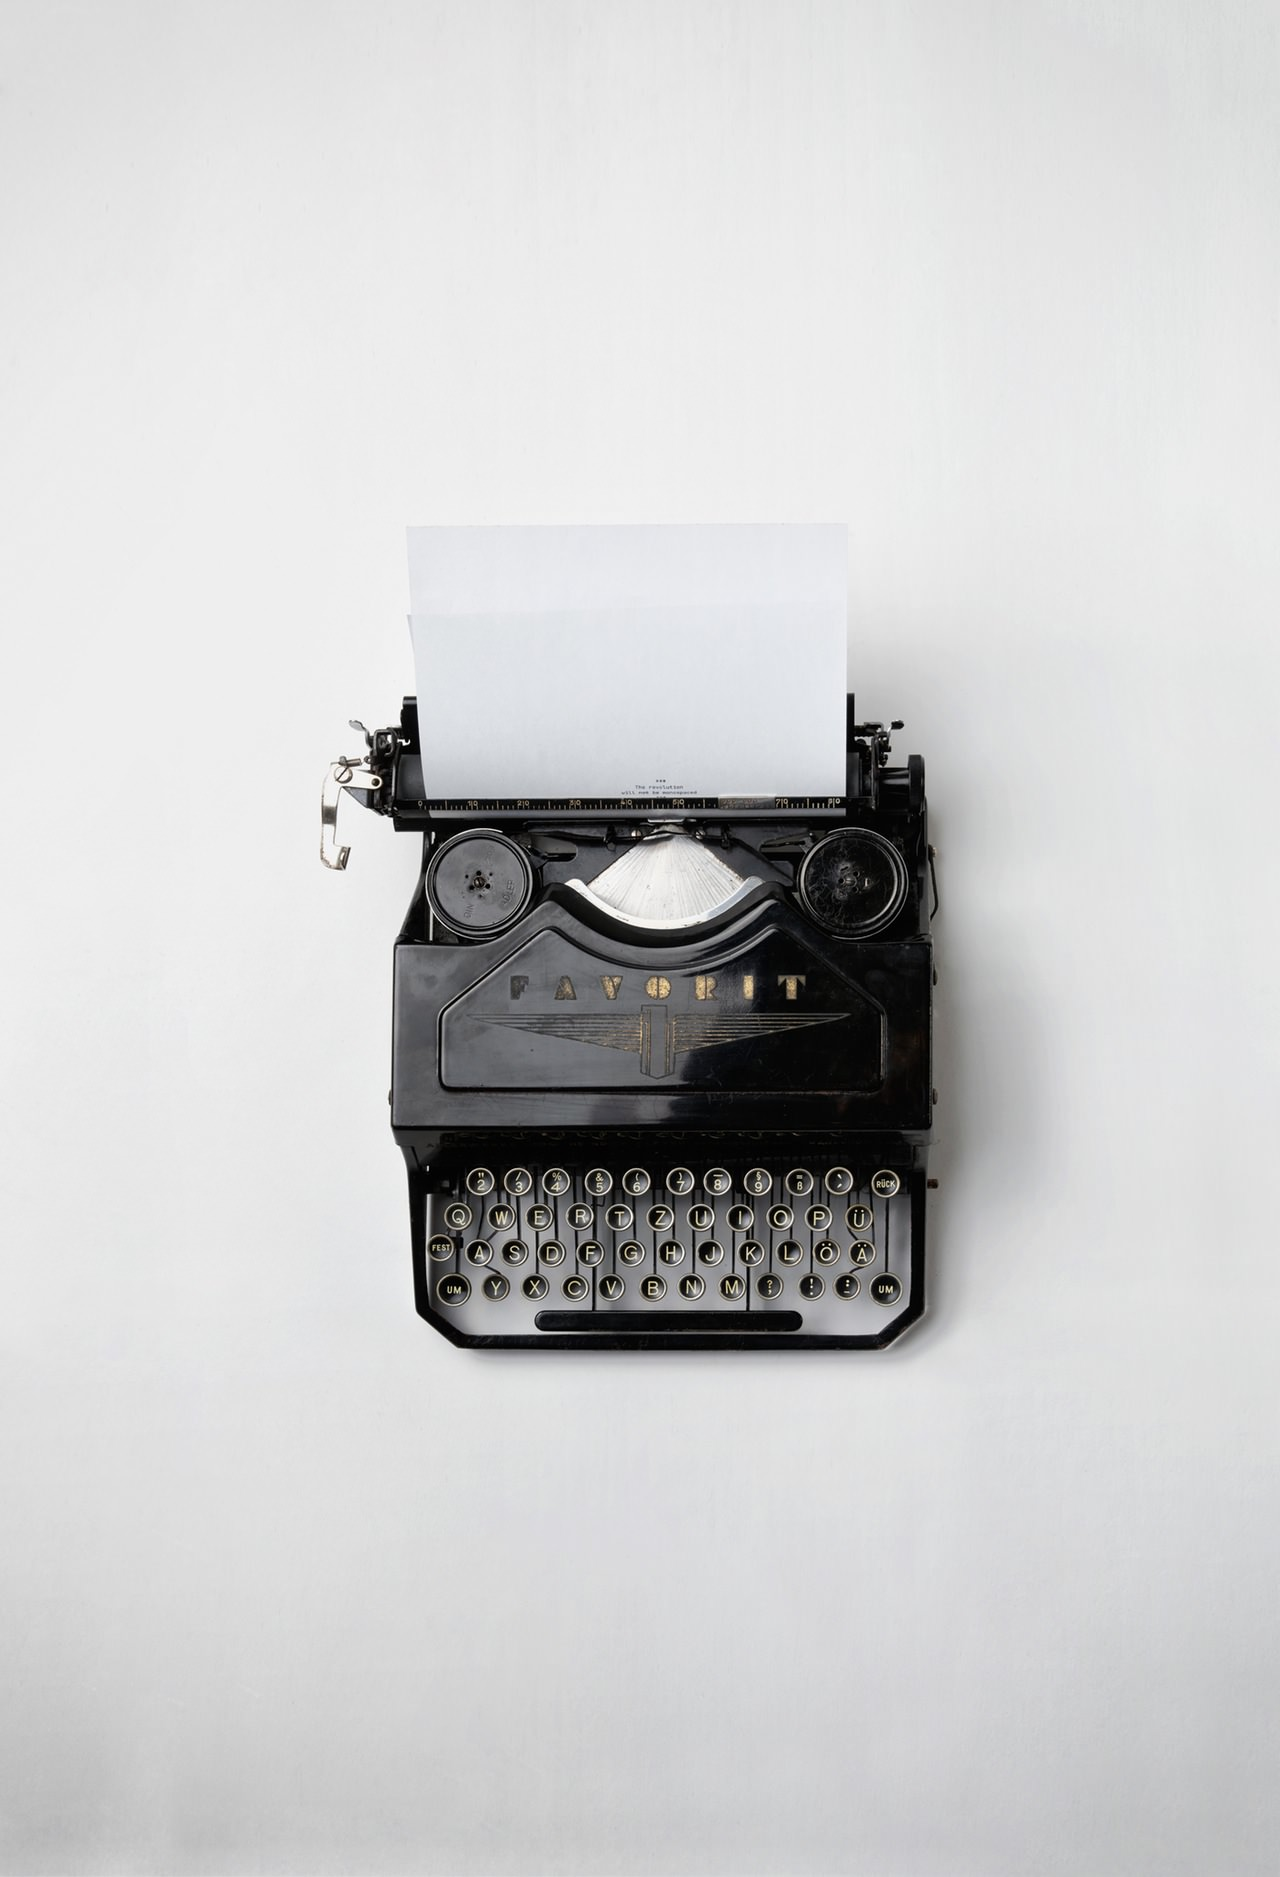 typing-vintage-technology-keyboard.jpg